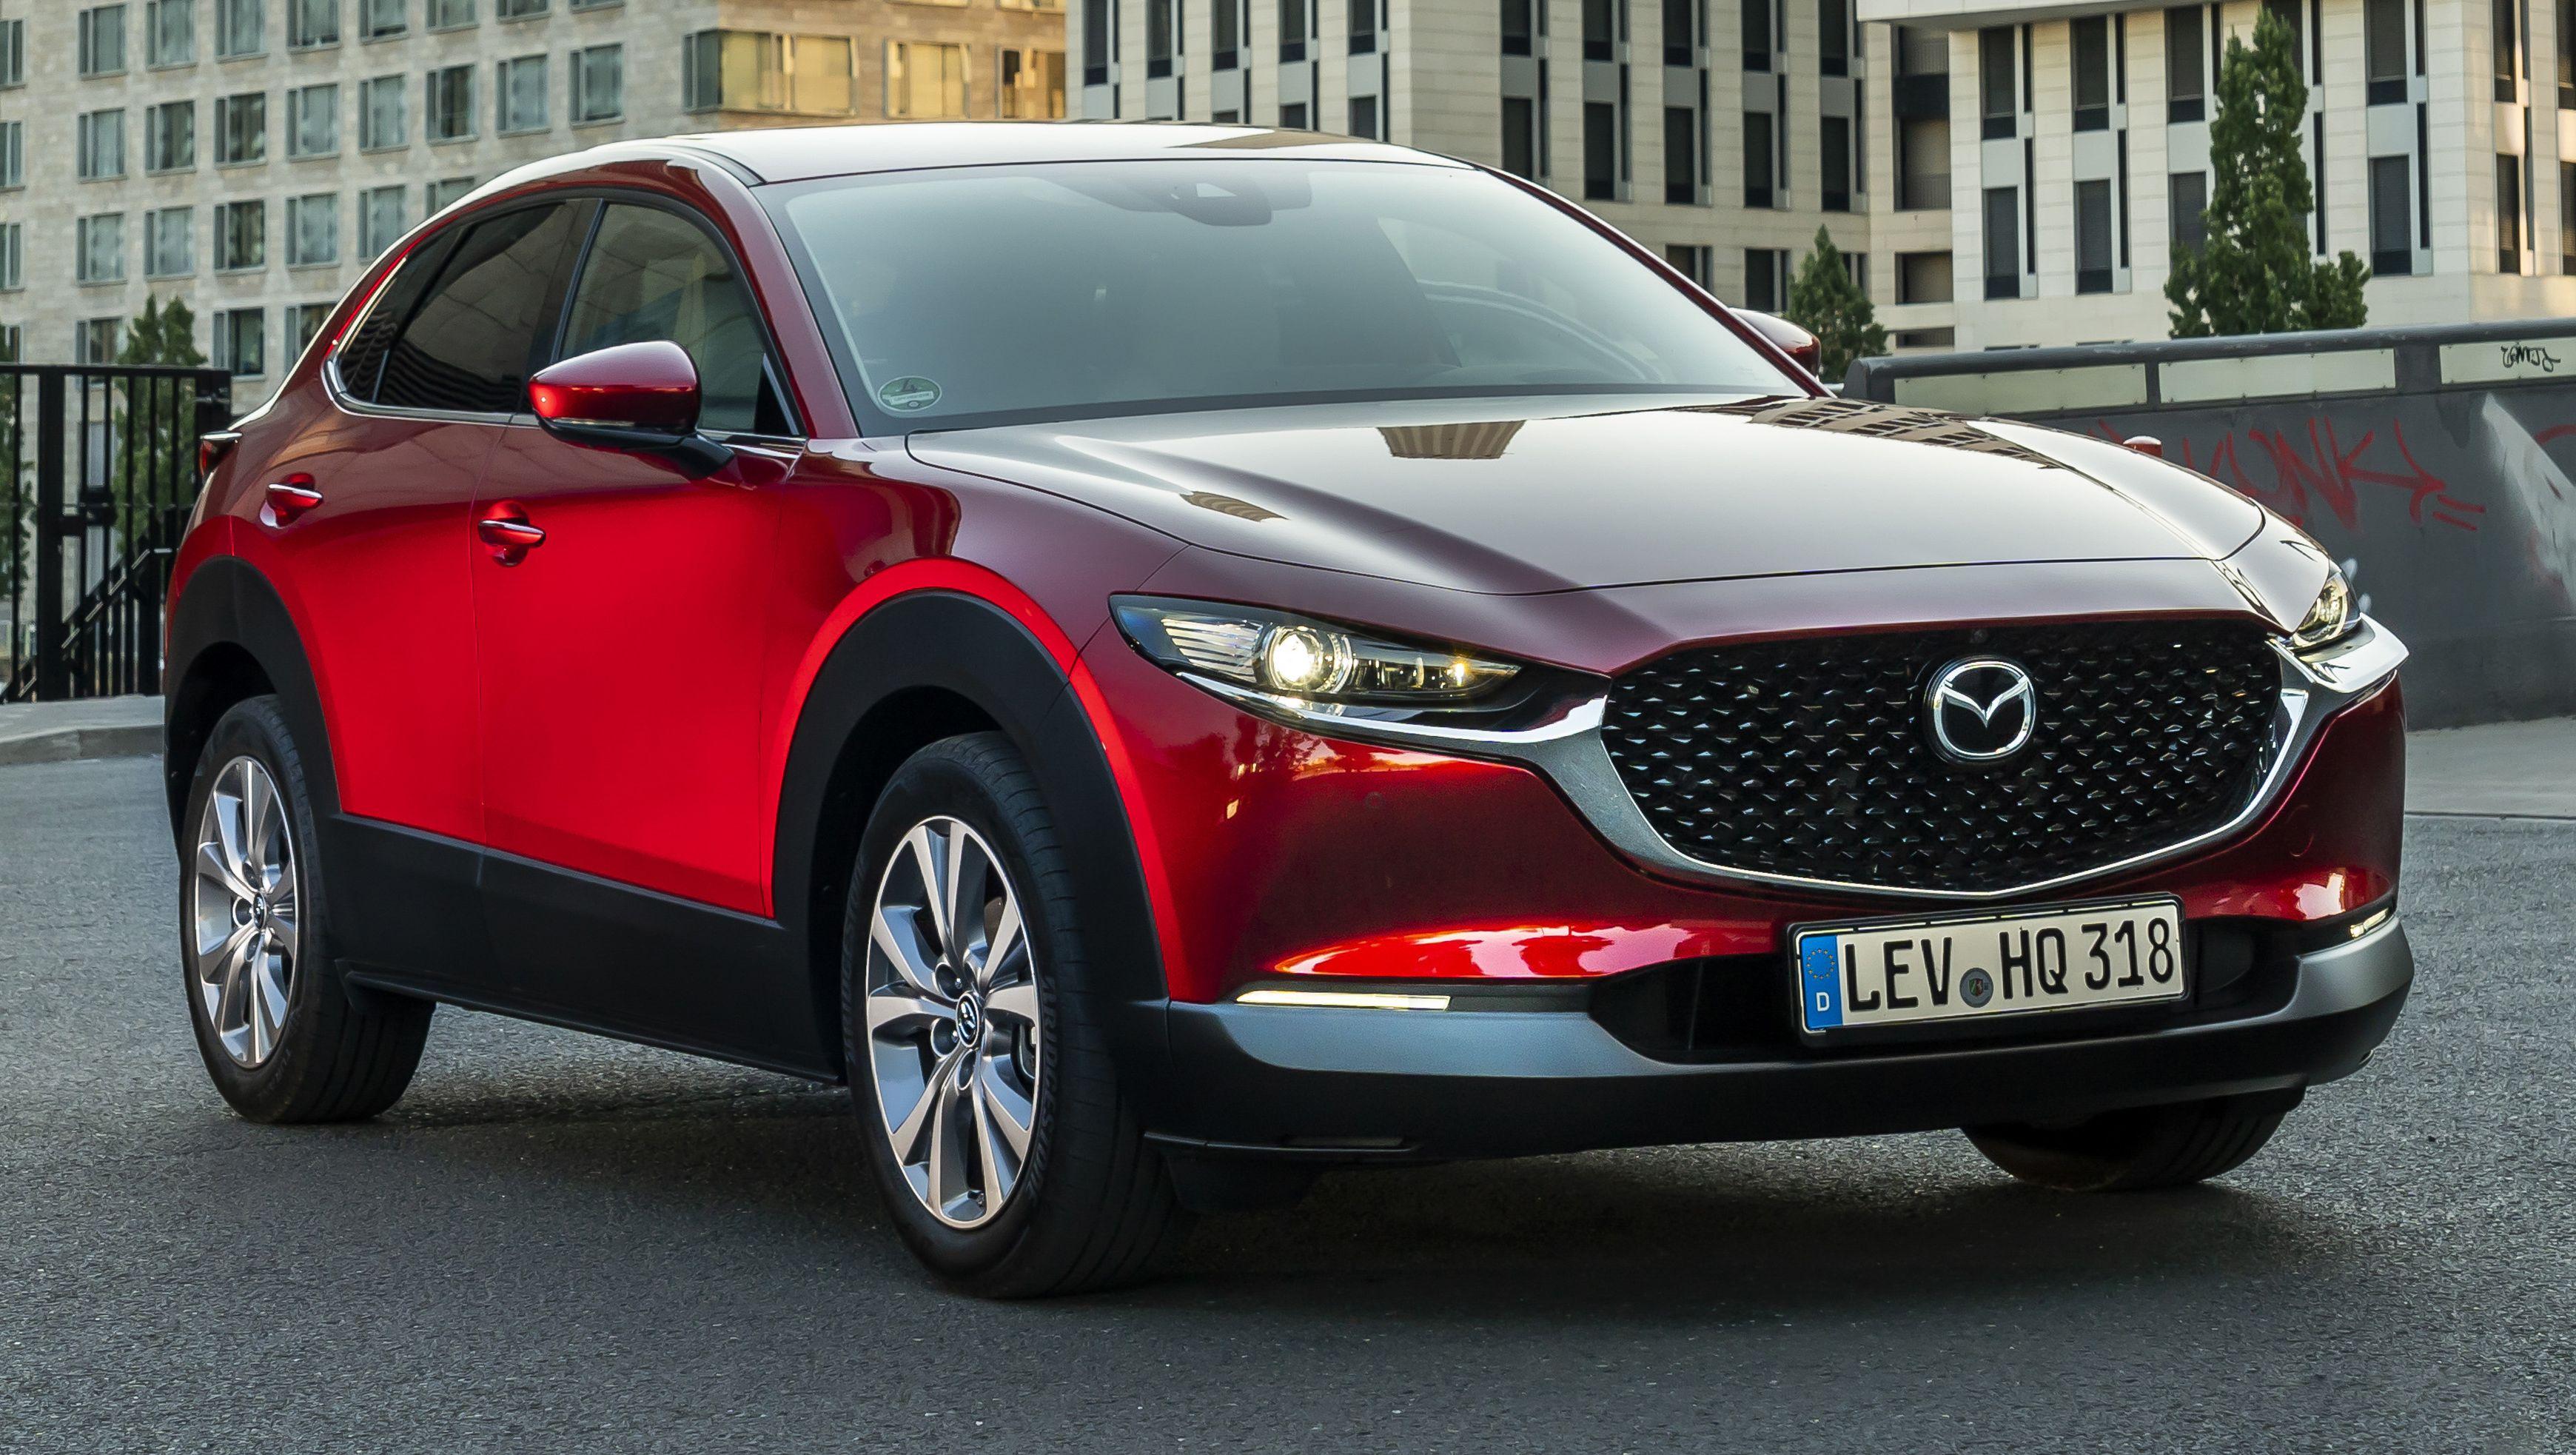 2019 Mazda Cx 5 News Upgrades Price >> Mazda Cx 30 Upgraded Cx 5 Coming To Malaysia